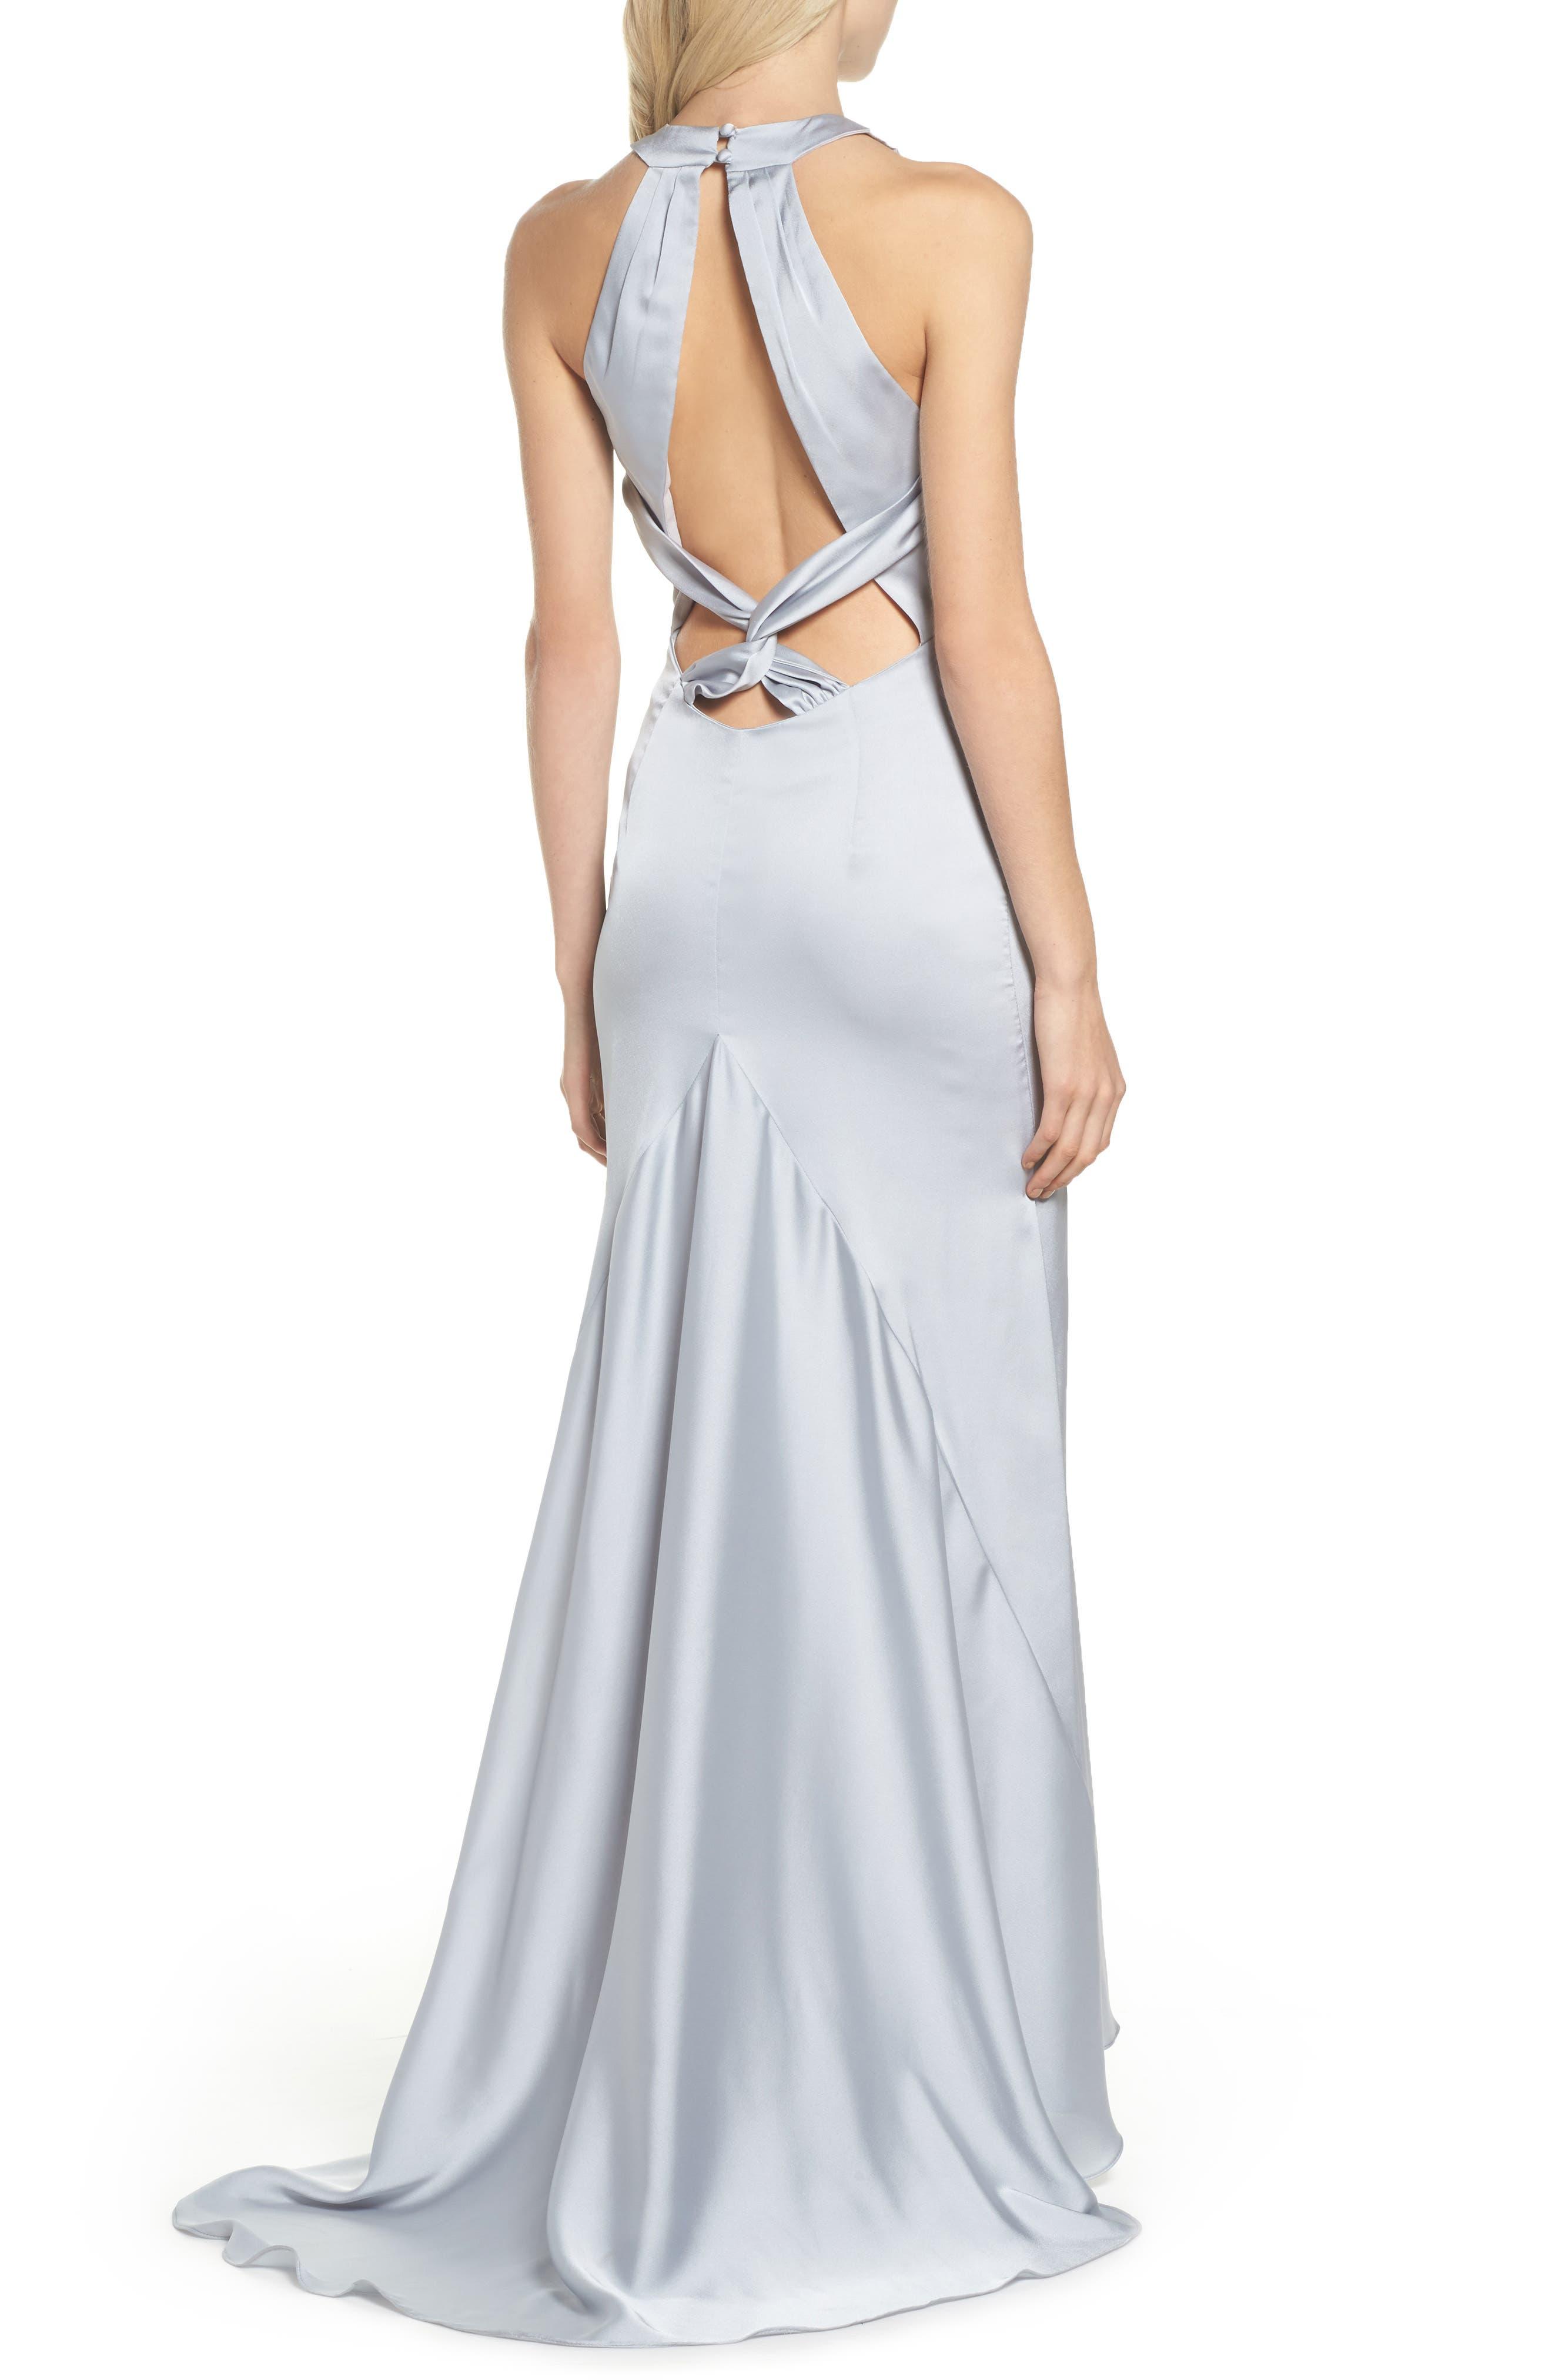 Amara Cross Back Satin Gown,                             Alternate thumbnail 2, color,                             044